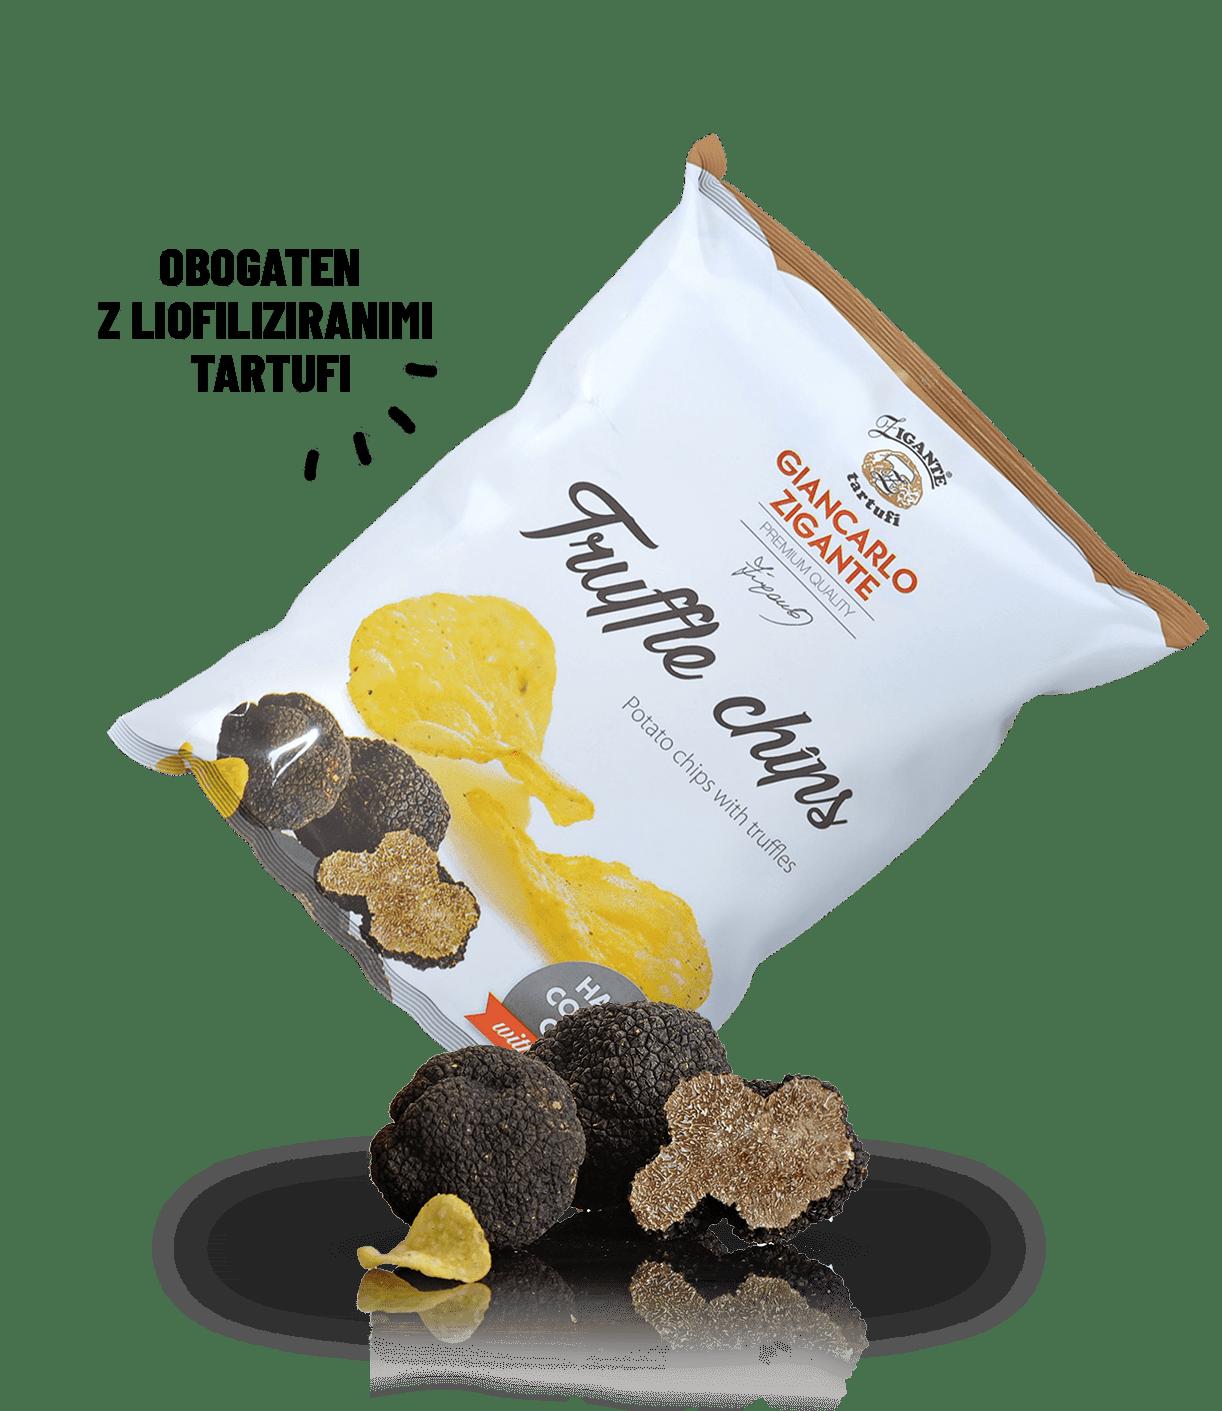 Zigante čips s tartufi